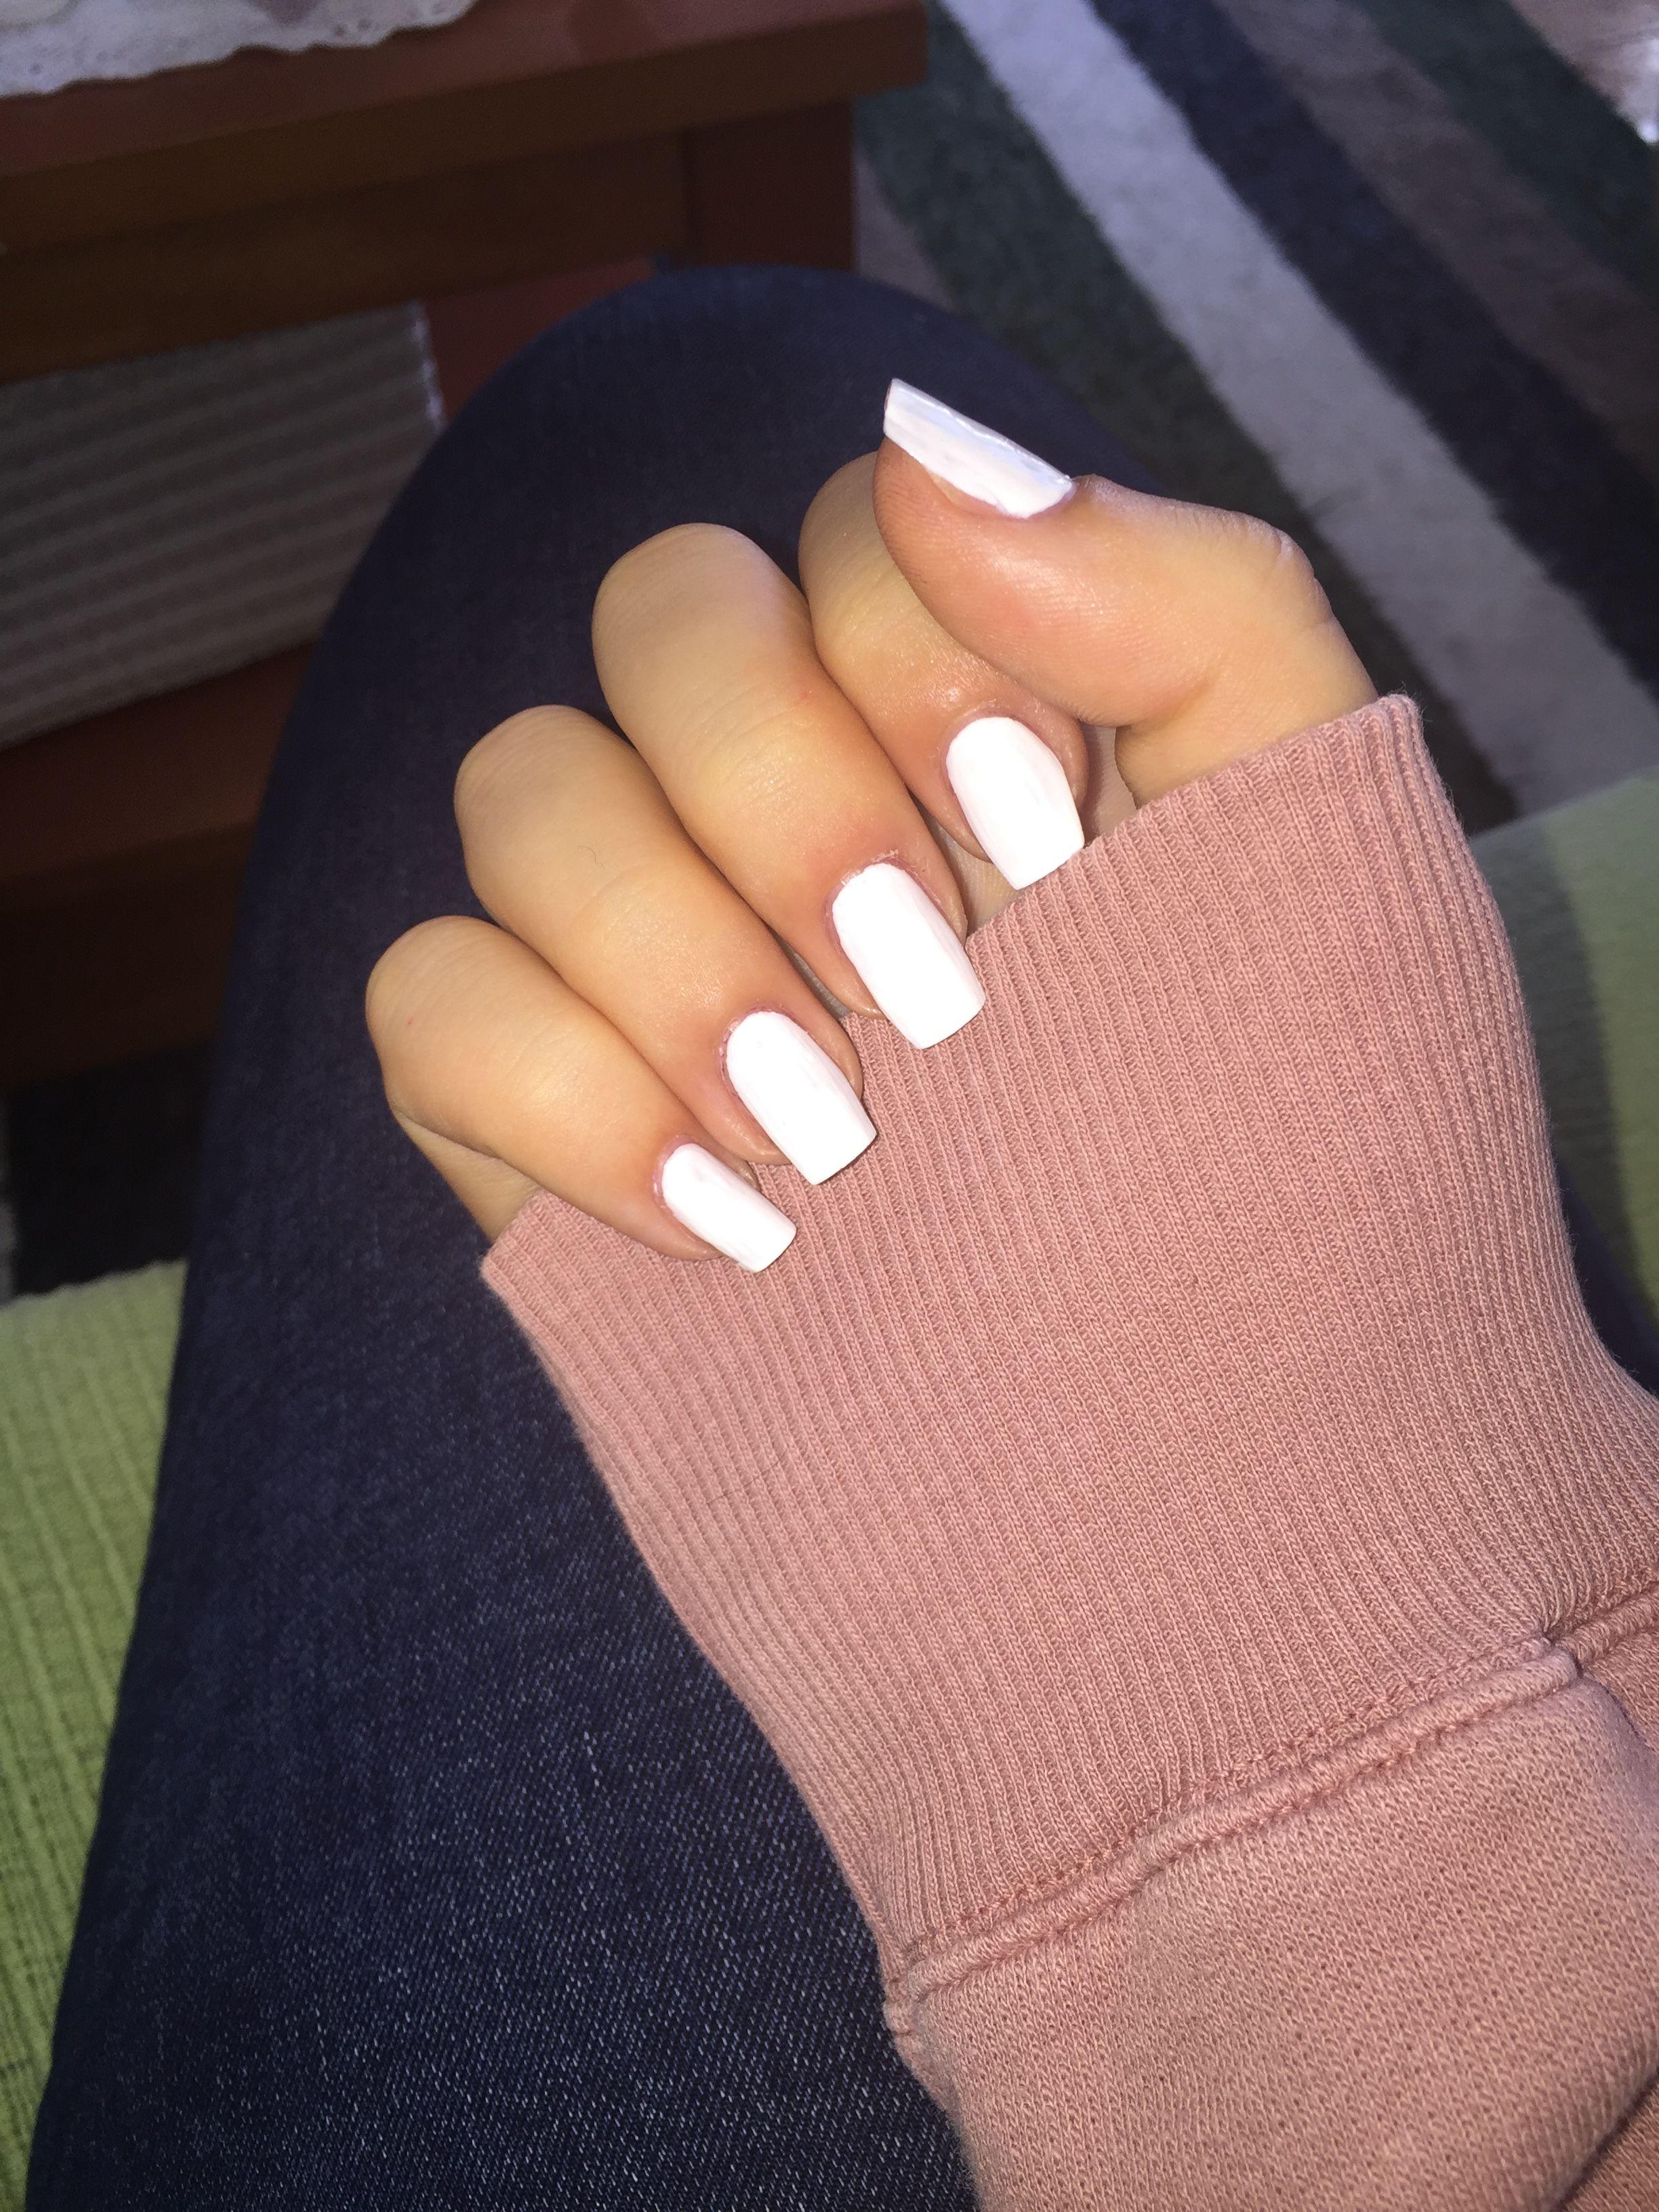 Pin By Marah On Unas White Acrylic Nails Long White Nails Short Acrylic Nails